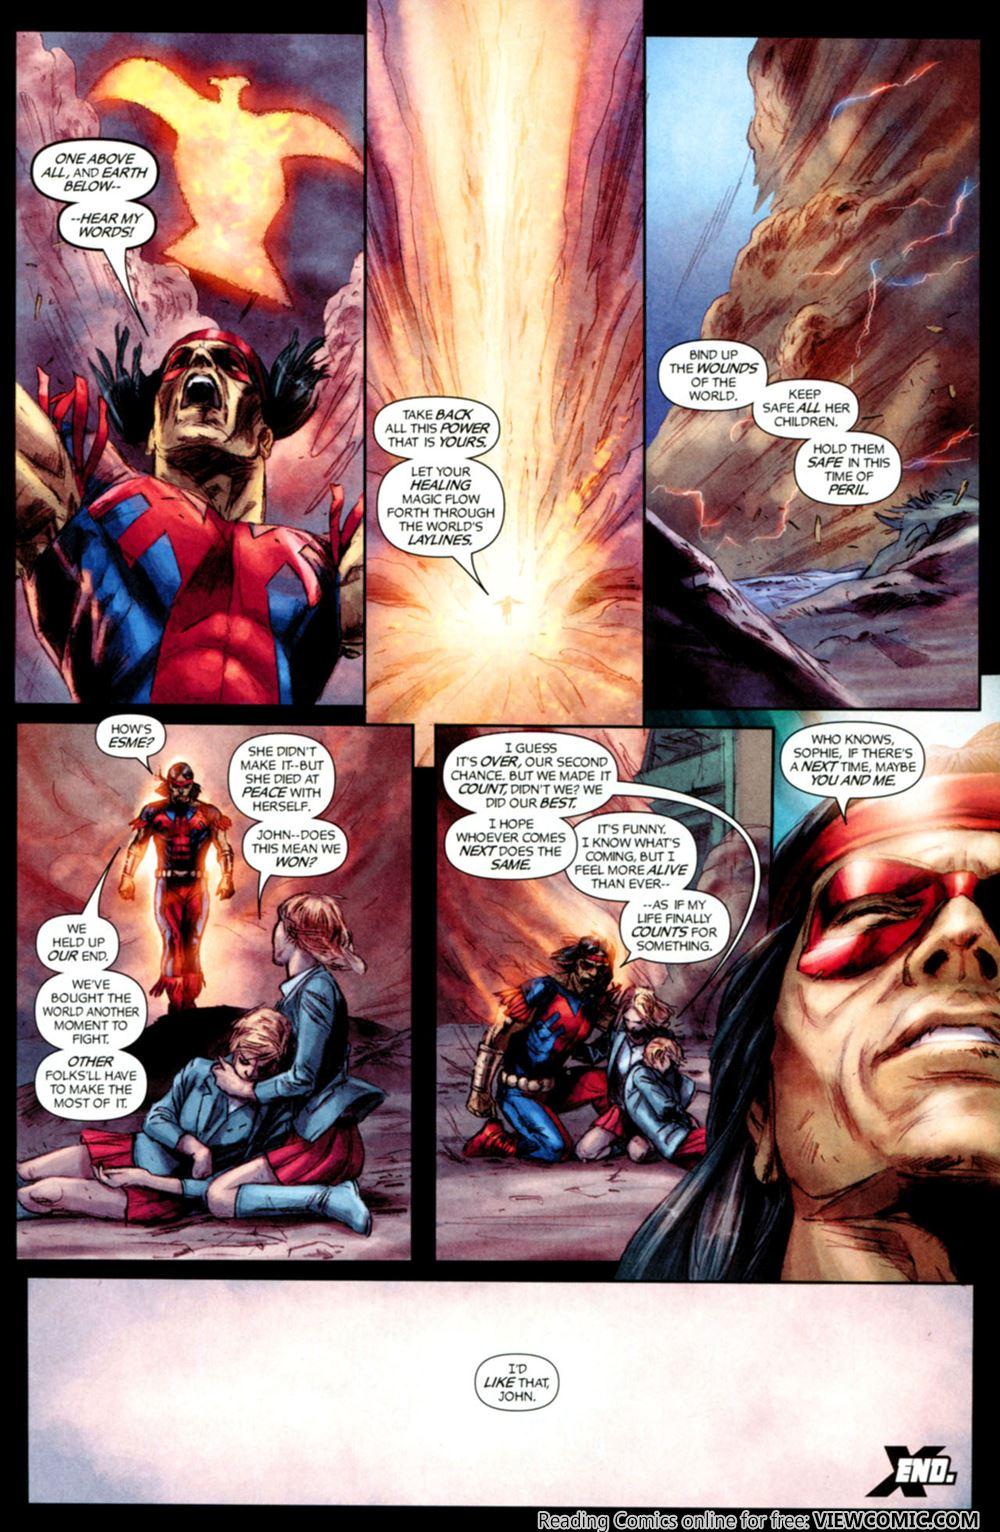 Chaos War 18 – X-Men 2 of 2 (2011) | Viewcomic reading